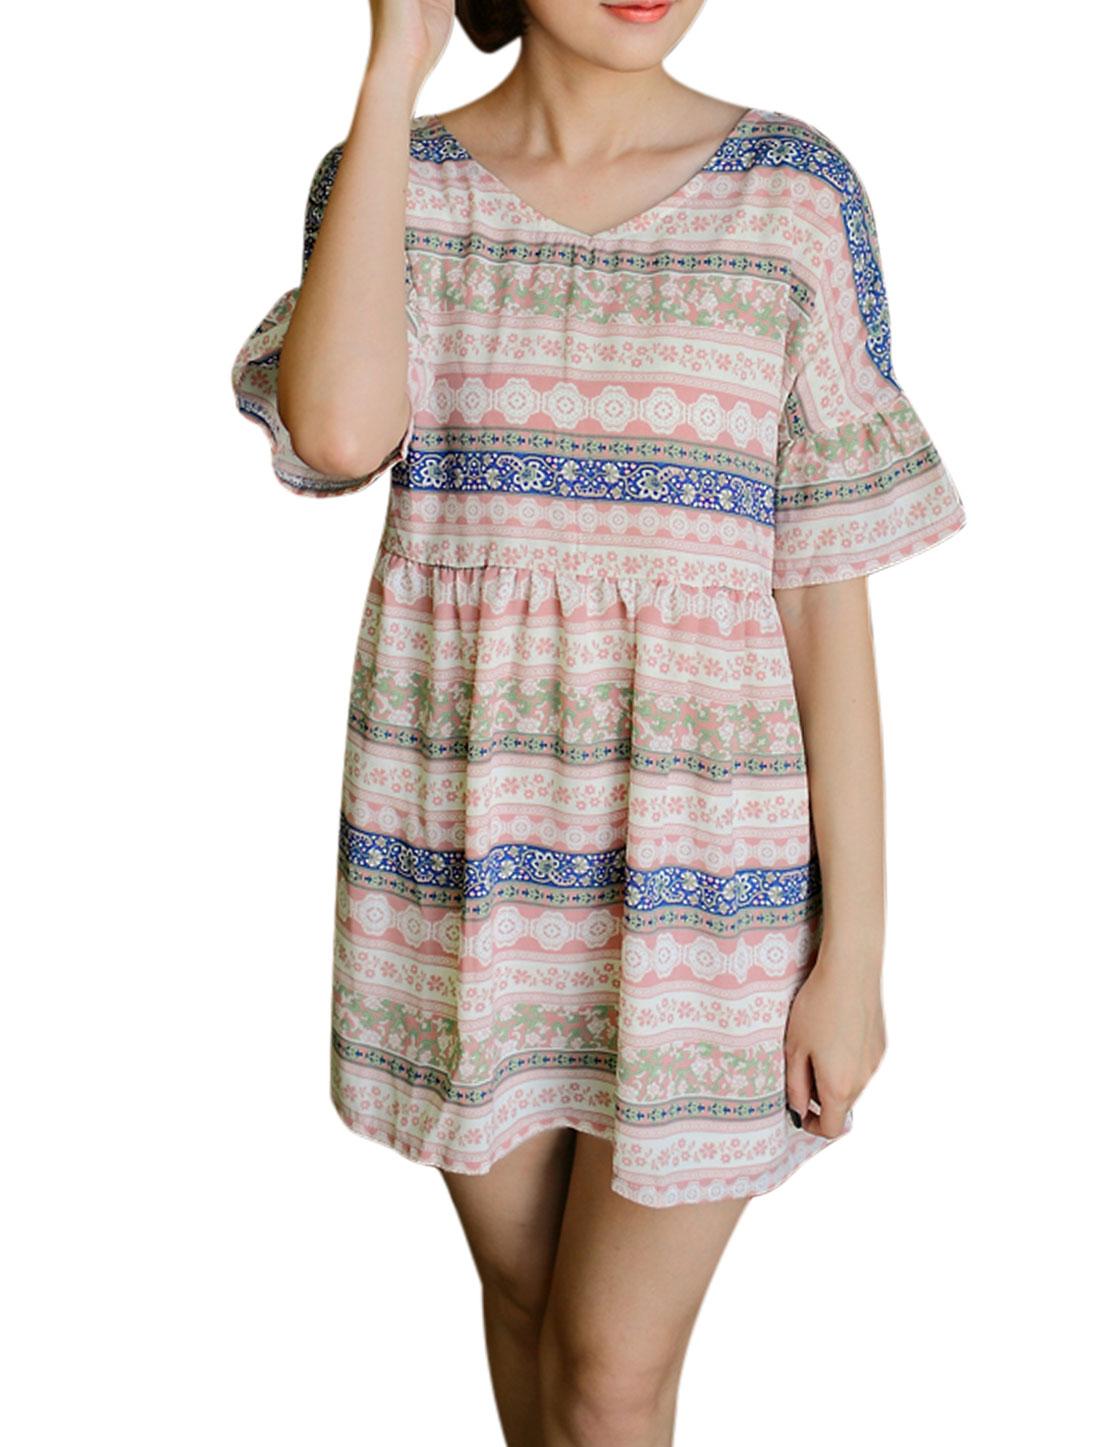 Women Short Sleeve V Neck Cut Out Back Novelty Print Dresses Pale Pink S